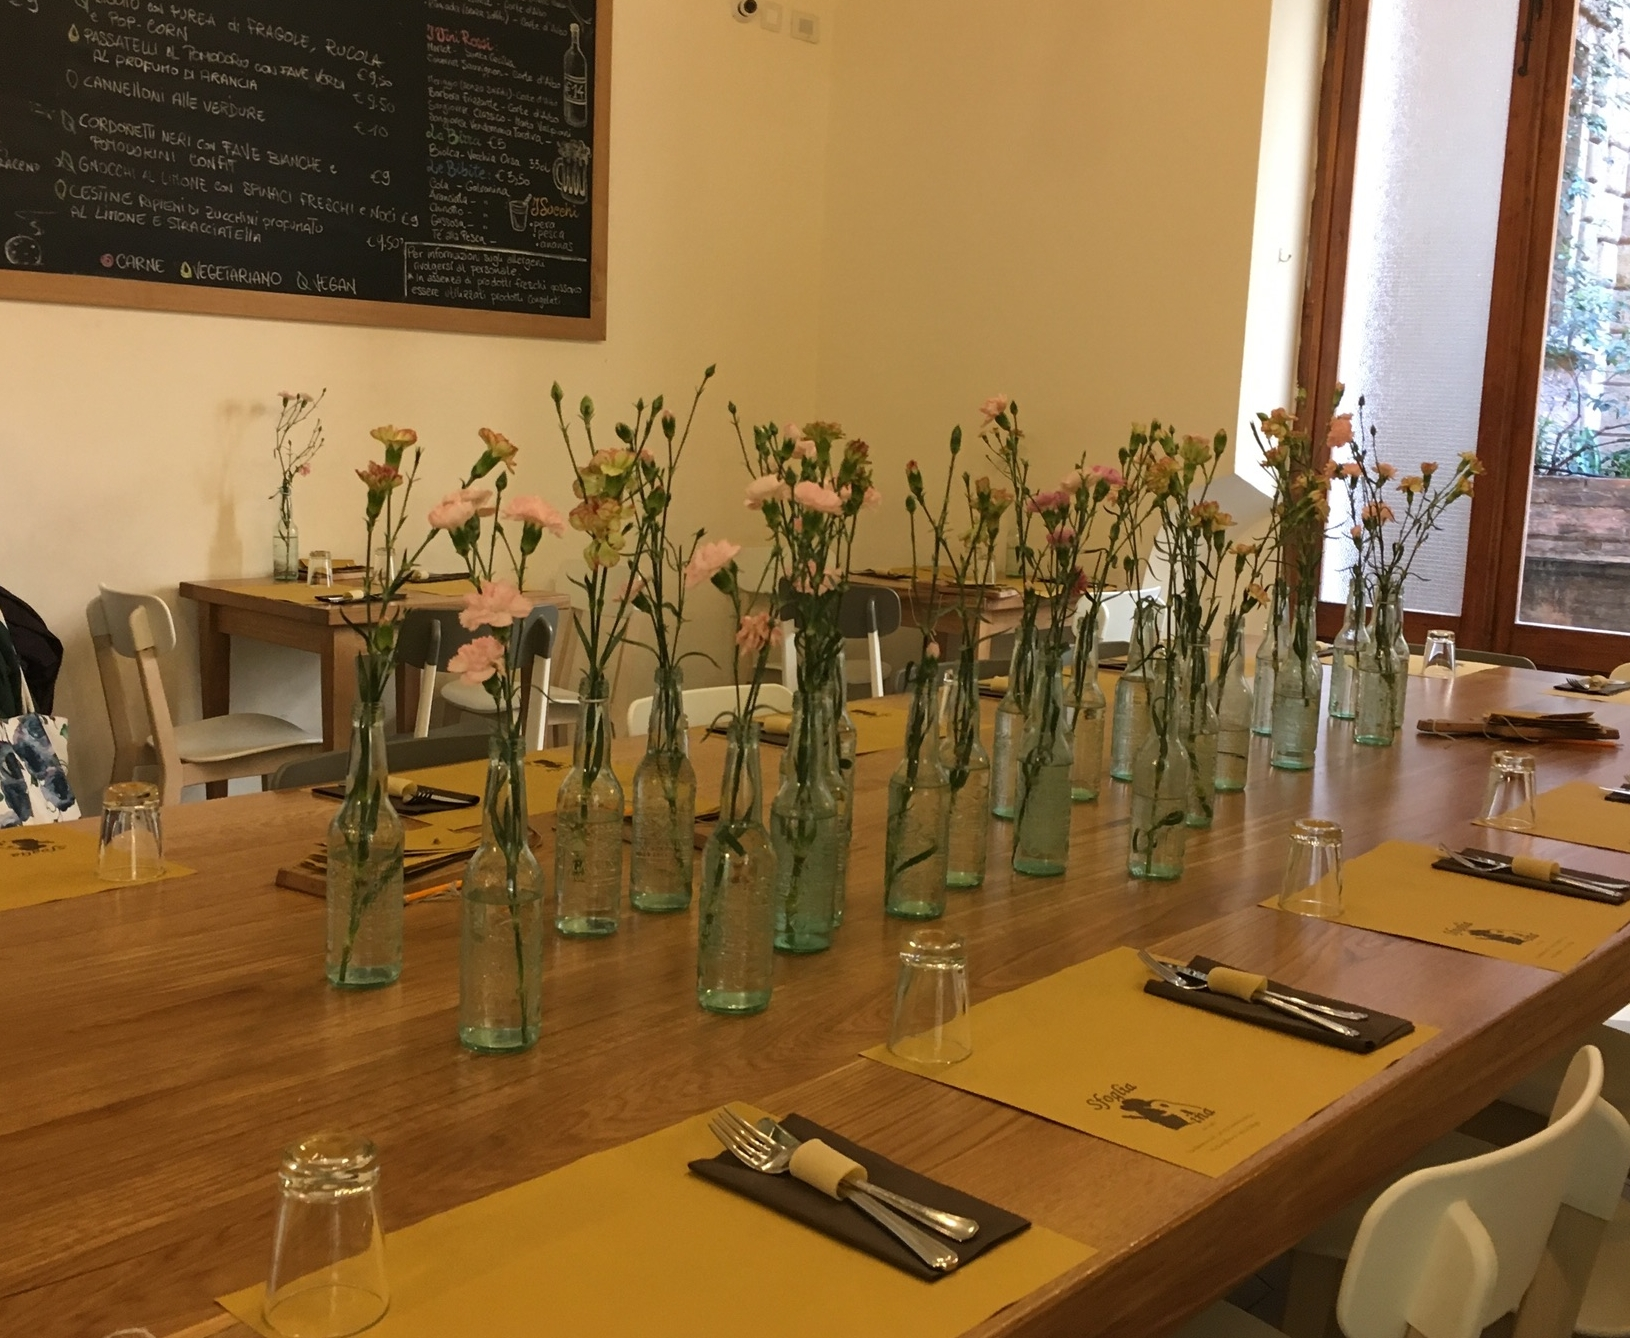 Communal dining table at Sfoglia Rina